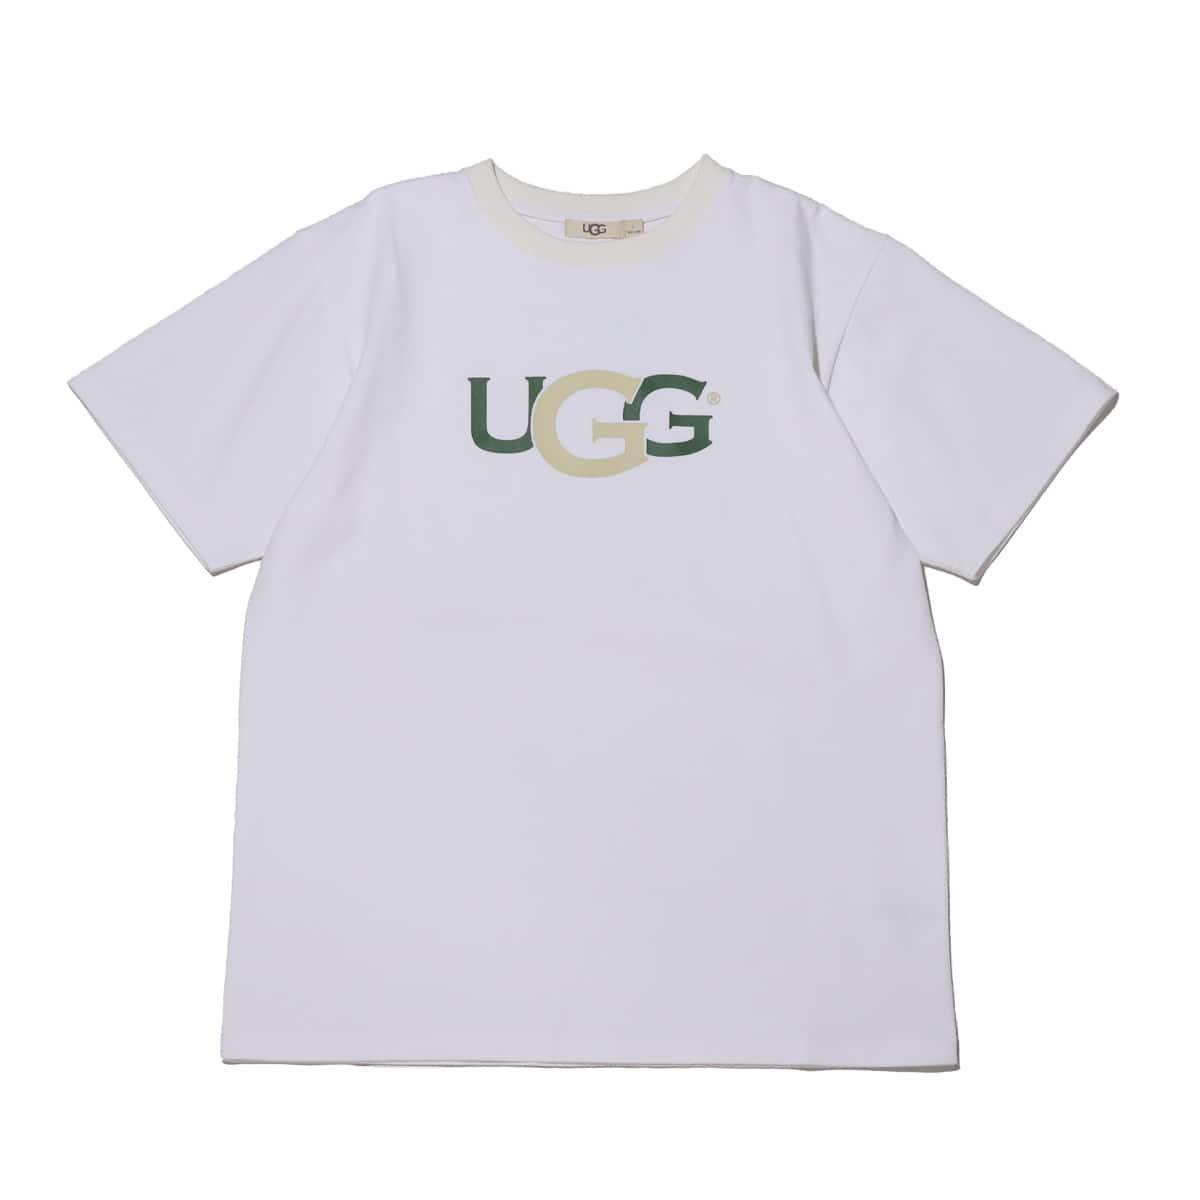 UGG スイッチングロゴ Tシャツ WHITE 21SS-I_photo_large